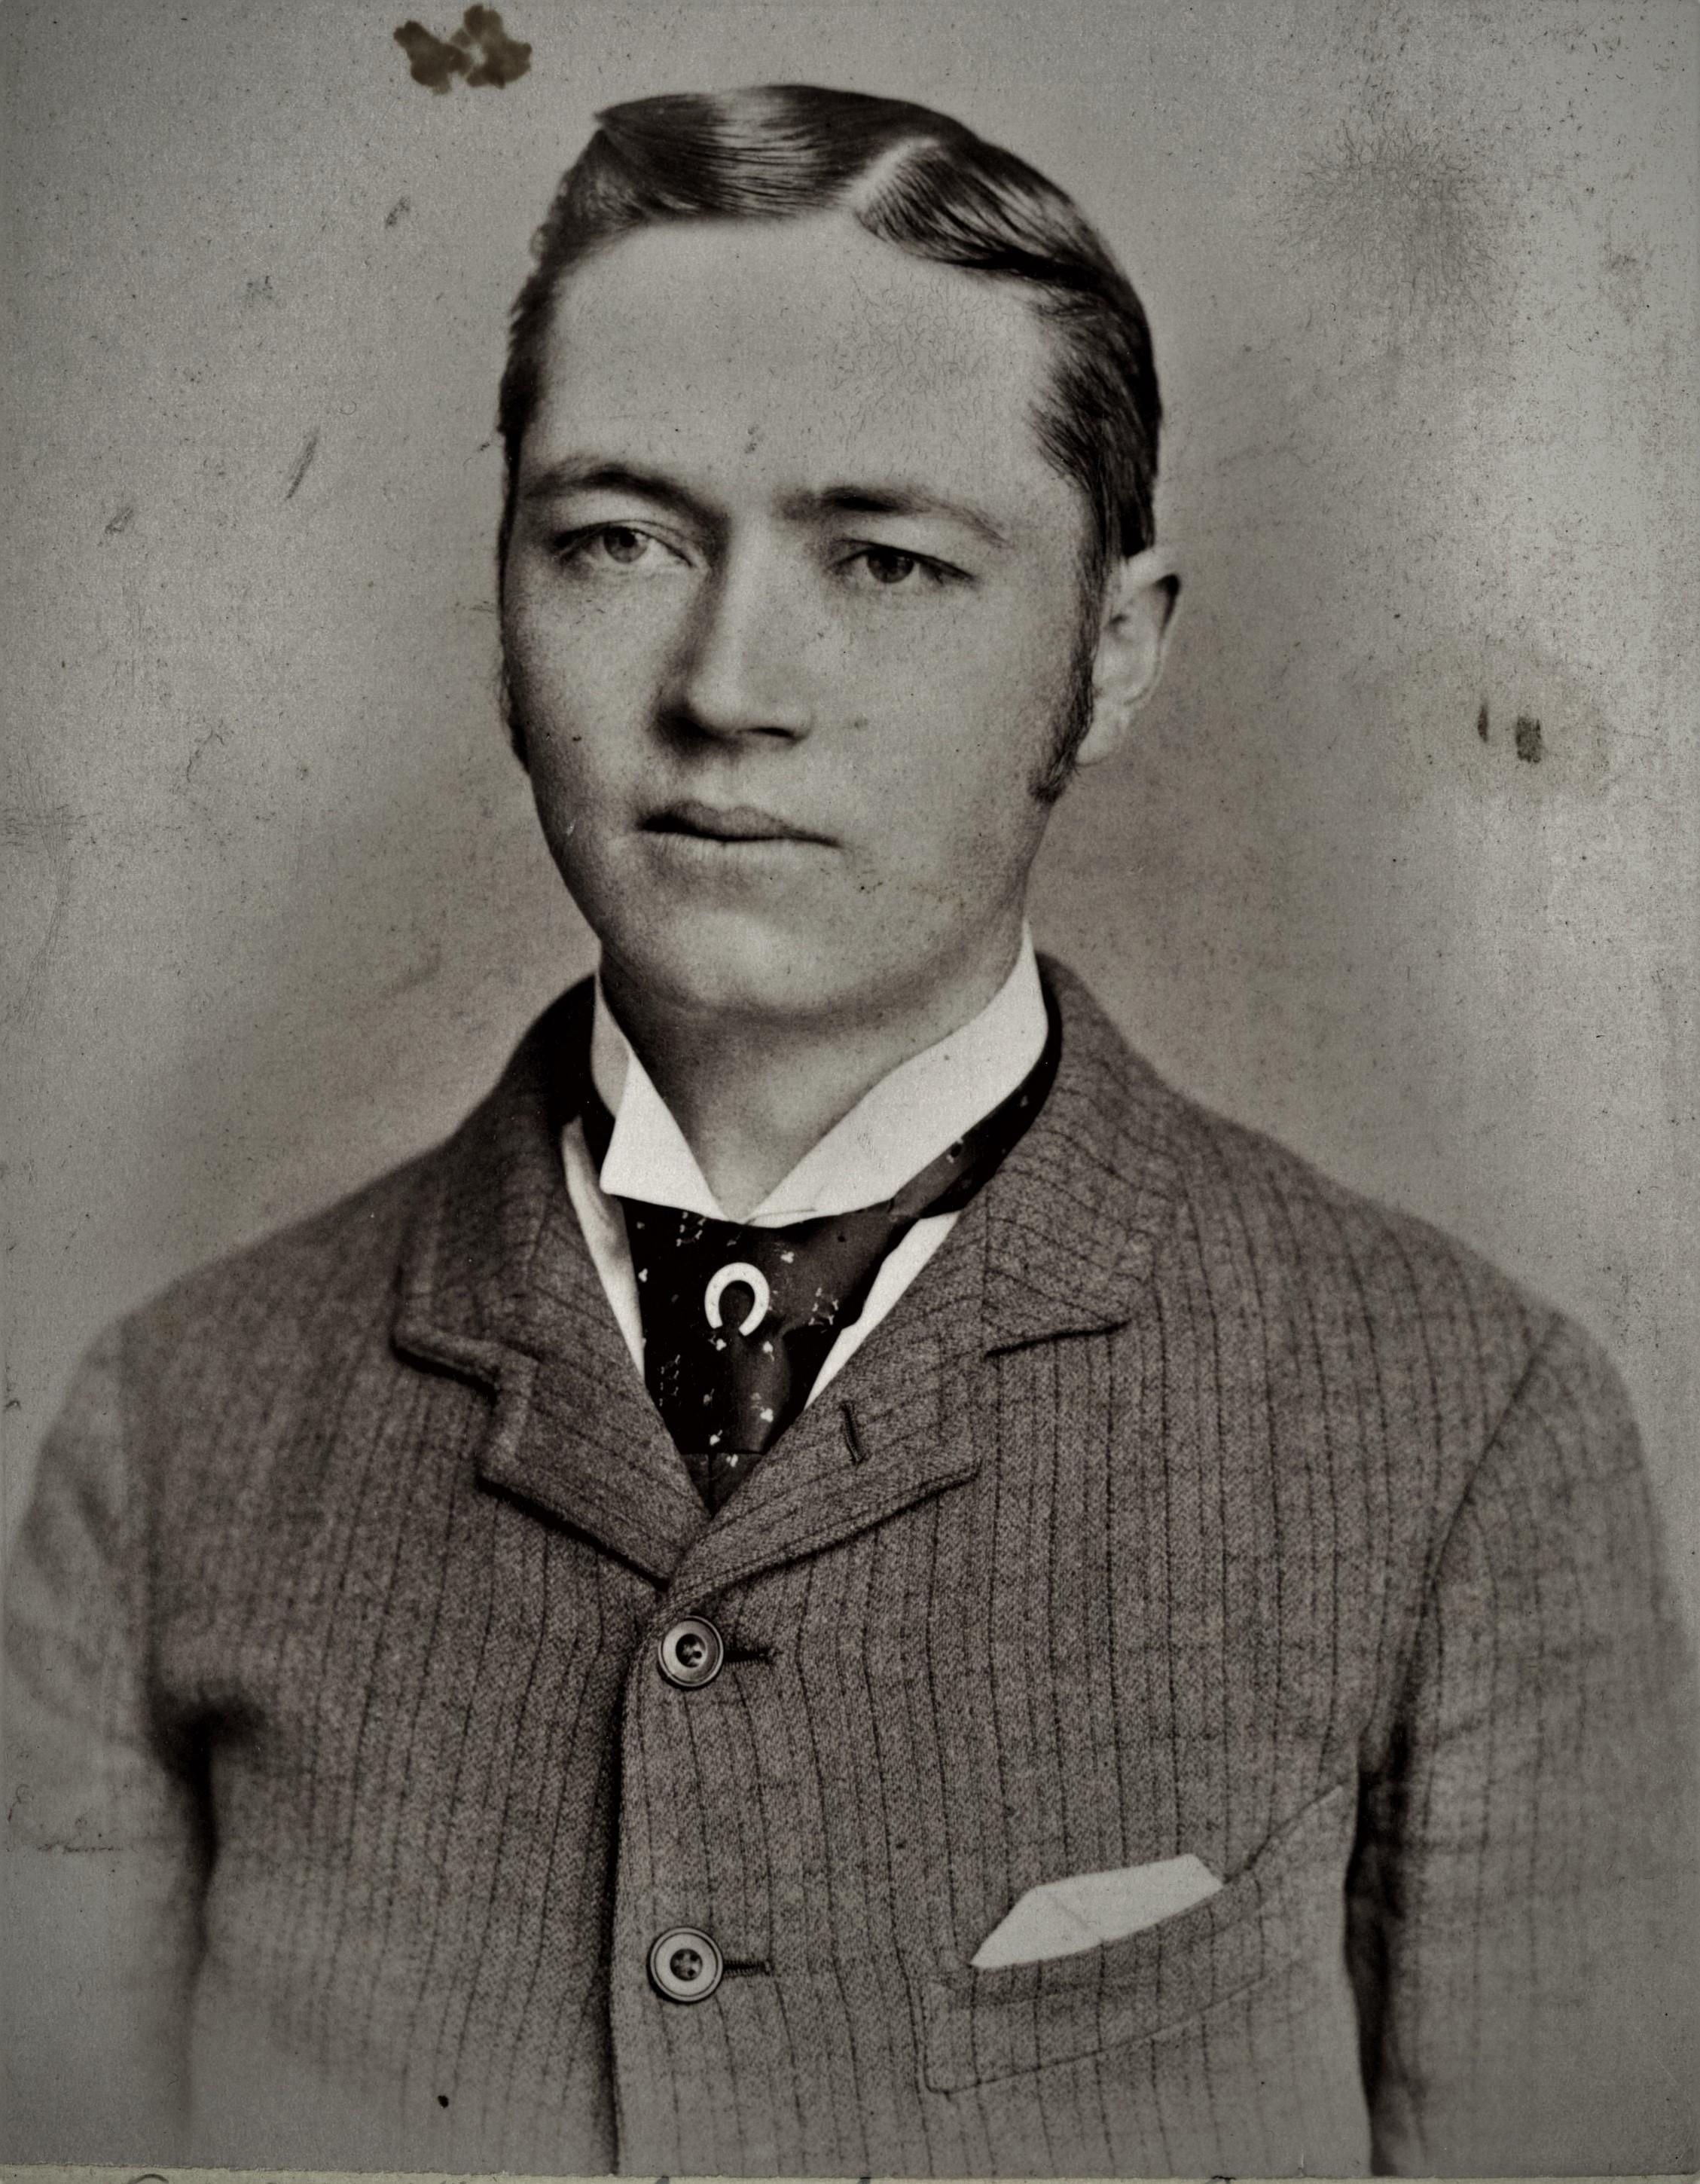 Bullock, Grant Young